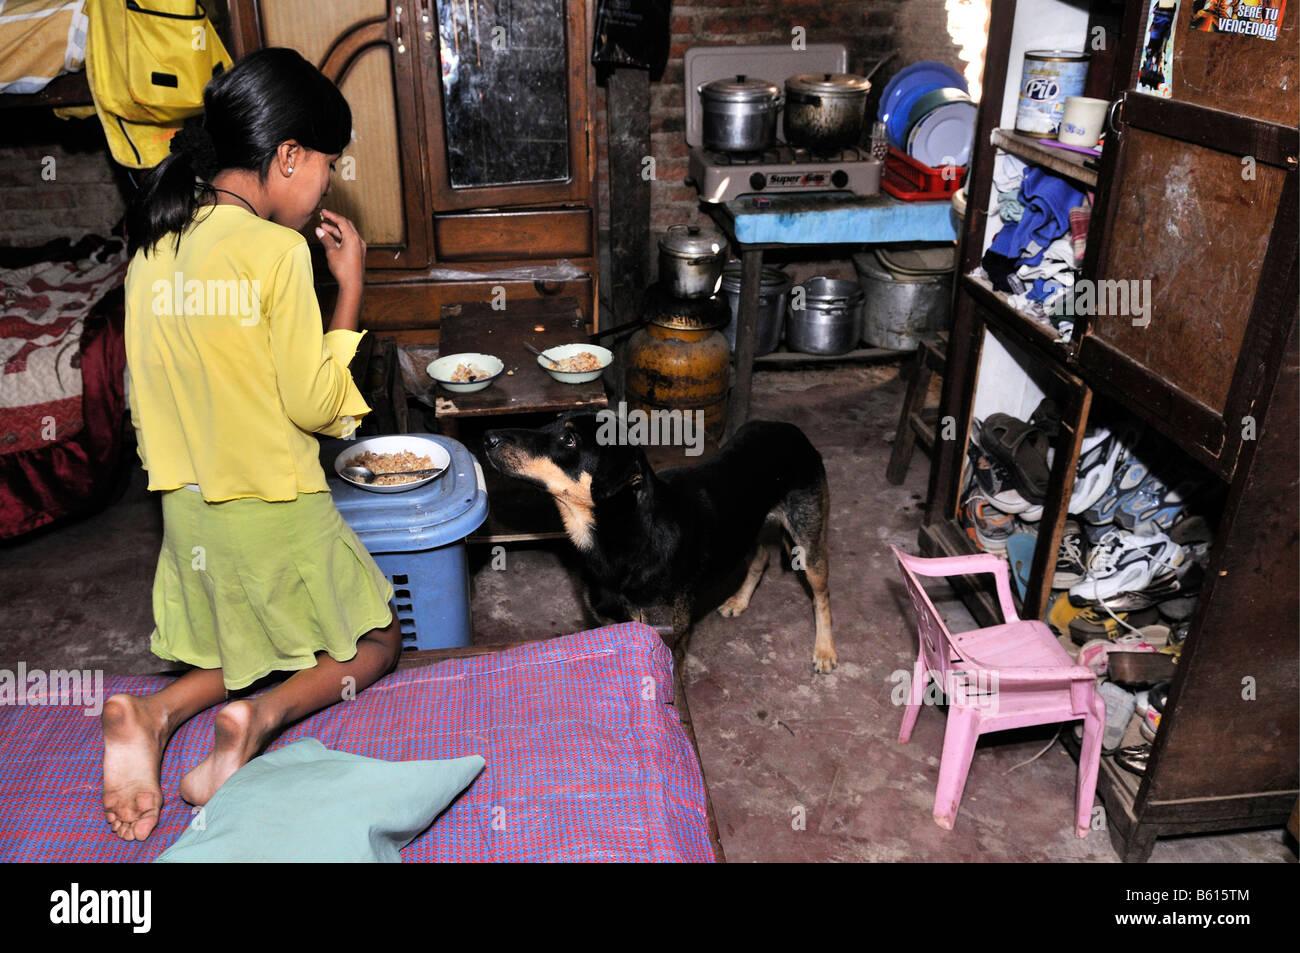 Girl and dog, poor living conditions in the Slum Area Plan 3000, Santa Cruz, Bolivia, South America - Stock Image